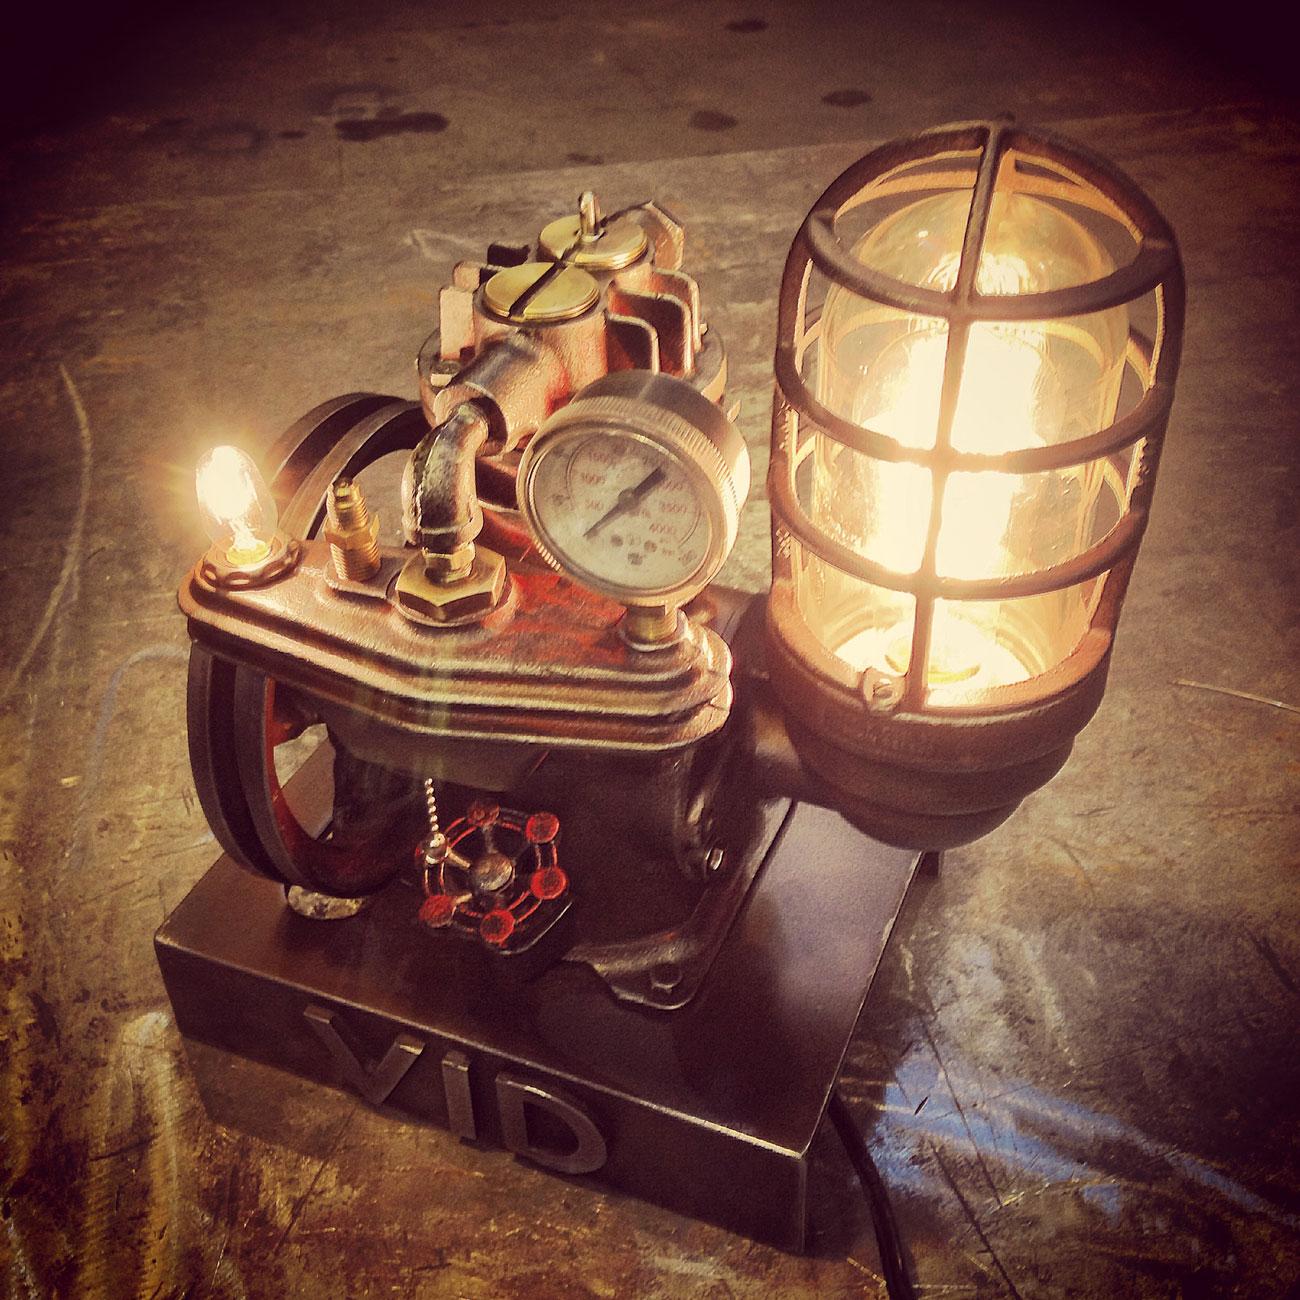 steampunk desk lamp lit